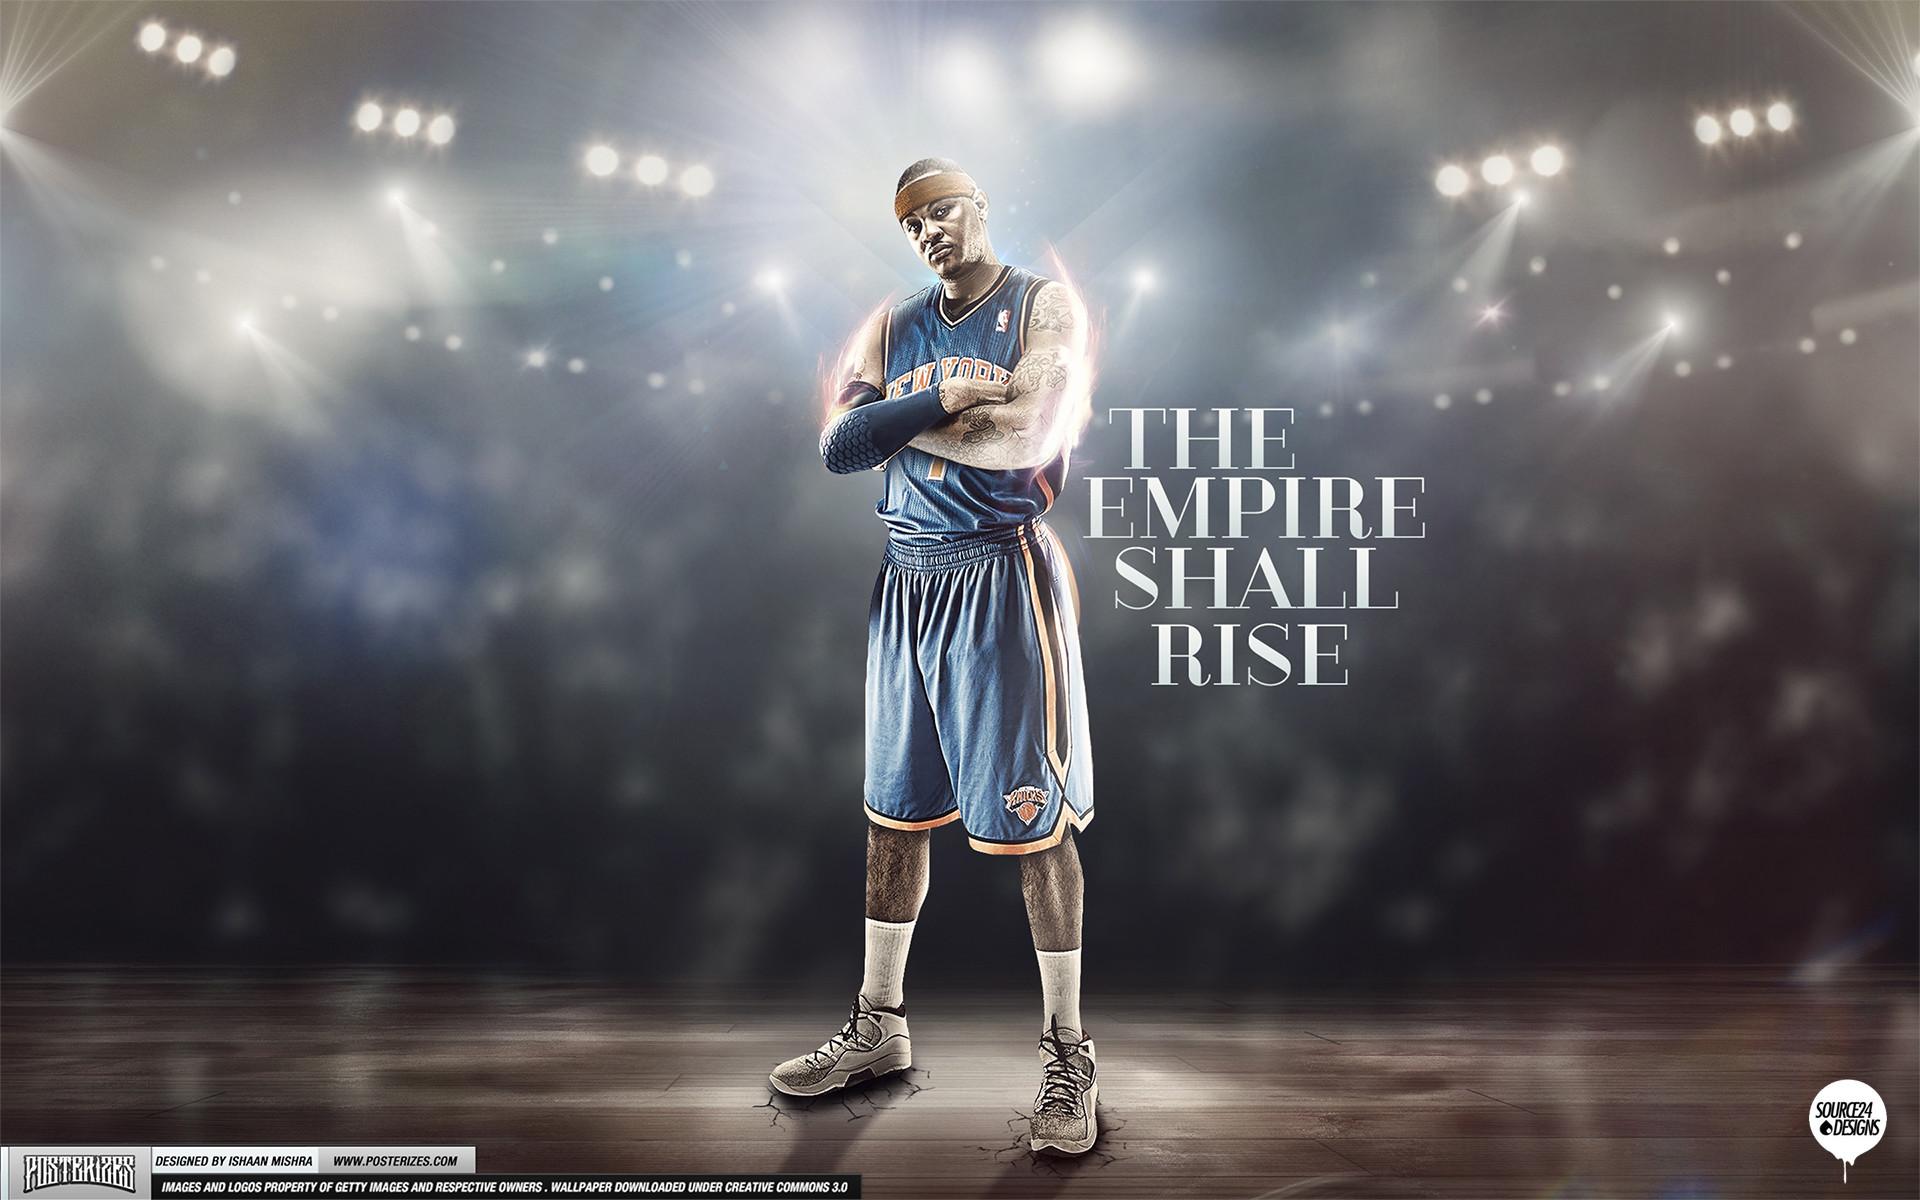 Res: 1920x1200, Carmelo Anthony Knicks Empire Wallpaper by IshaanMishra Carmelo Anthony  Knicks Empire Wallpaper by IshaanMishra